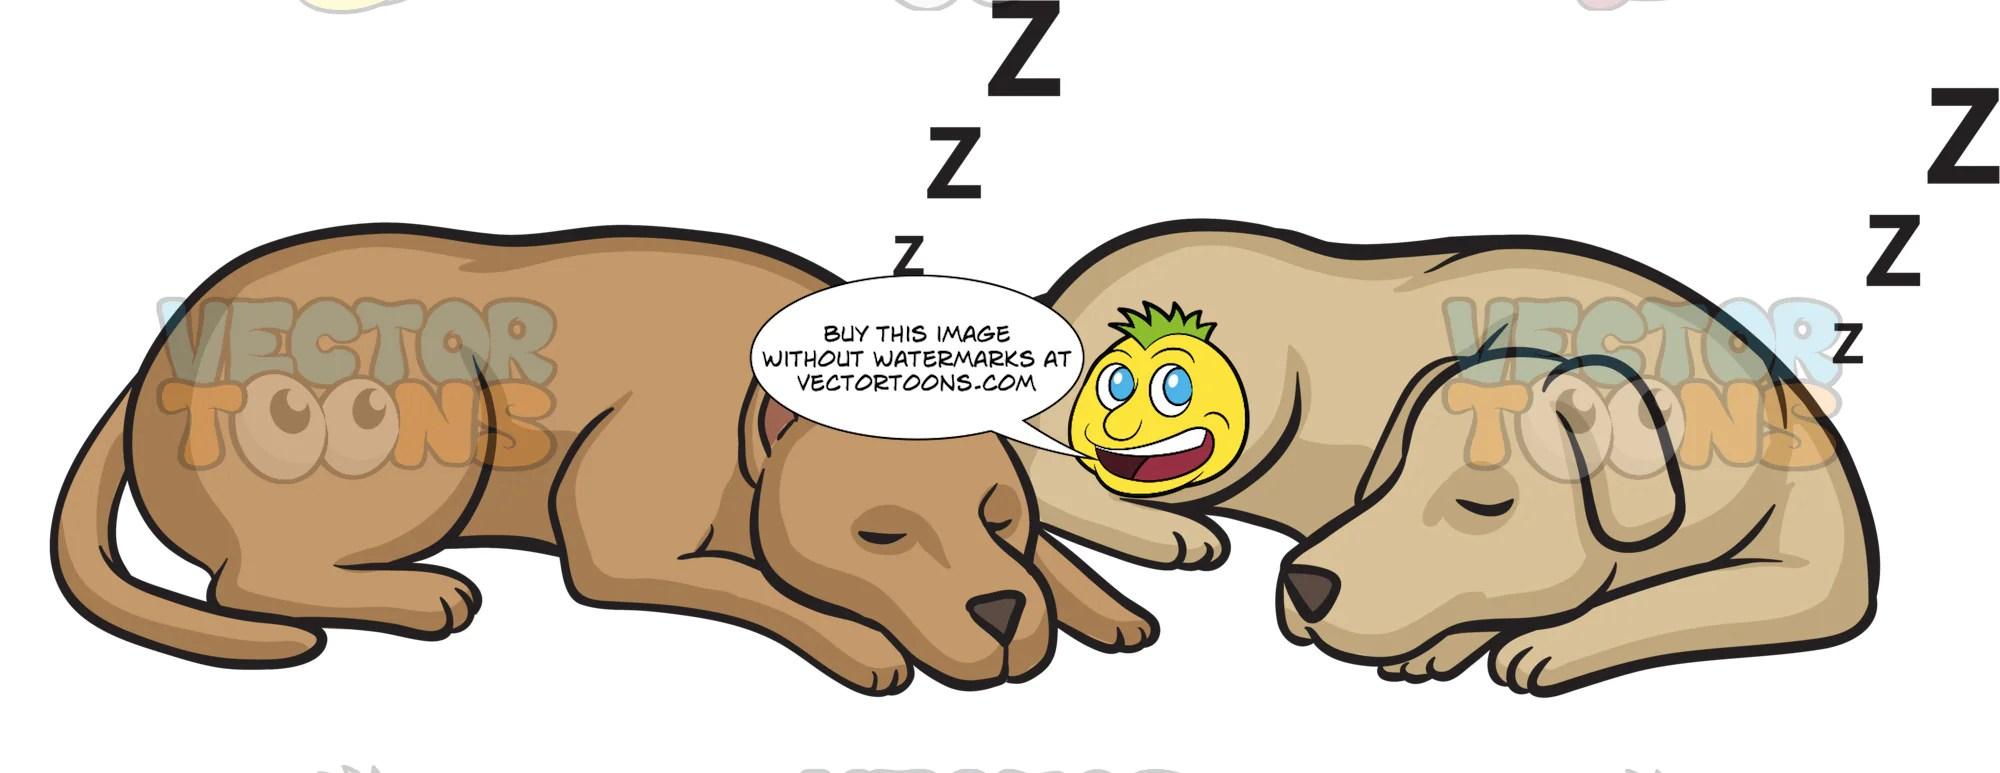 medium resolution of let sleeping dogs lie